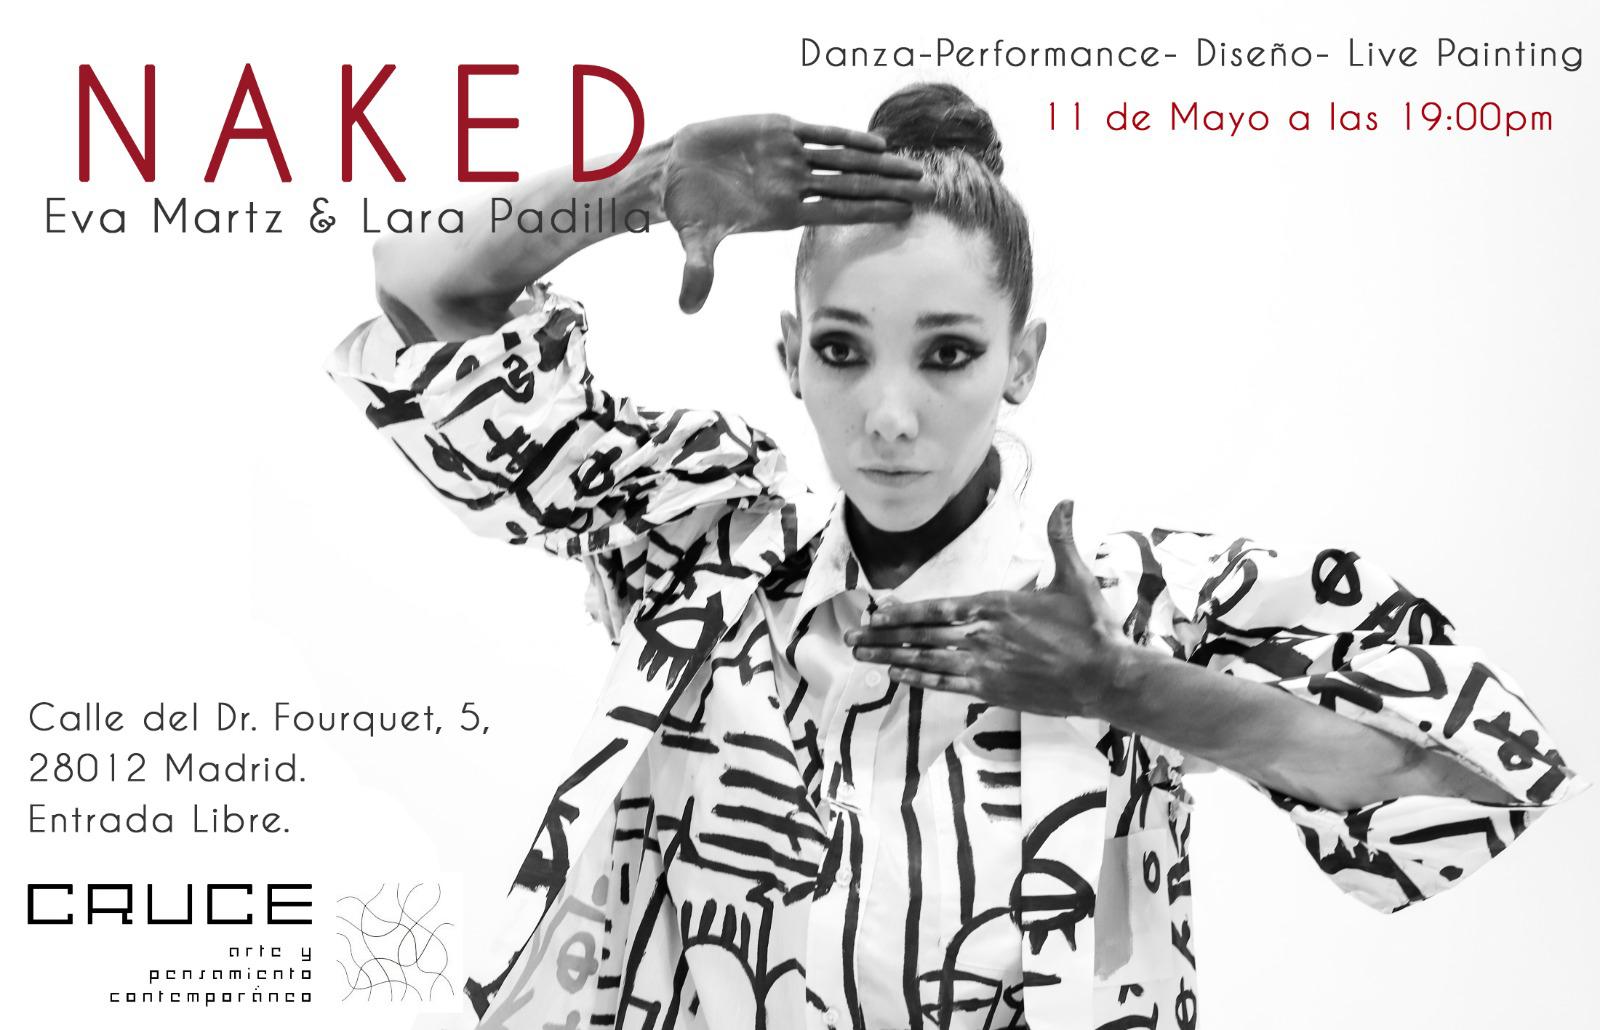 Lara Padilla y Eva Martz presentan Naked en CRUCE, Madrid